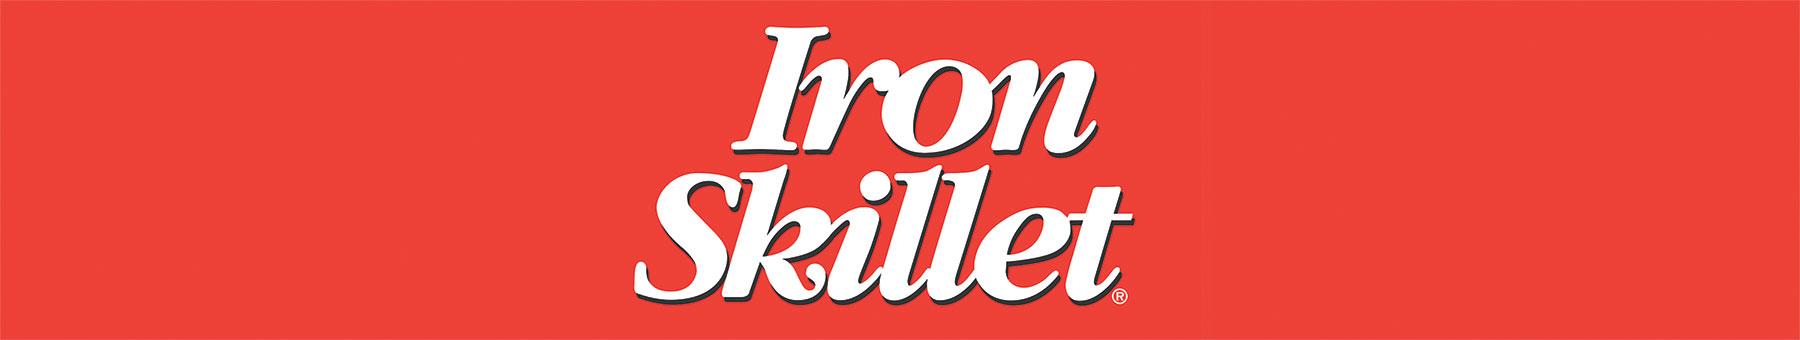 Iron-Skillet-web-wide.jpg